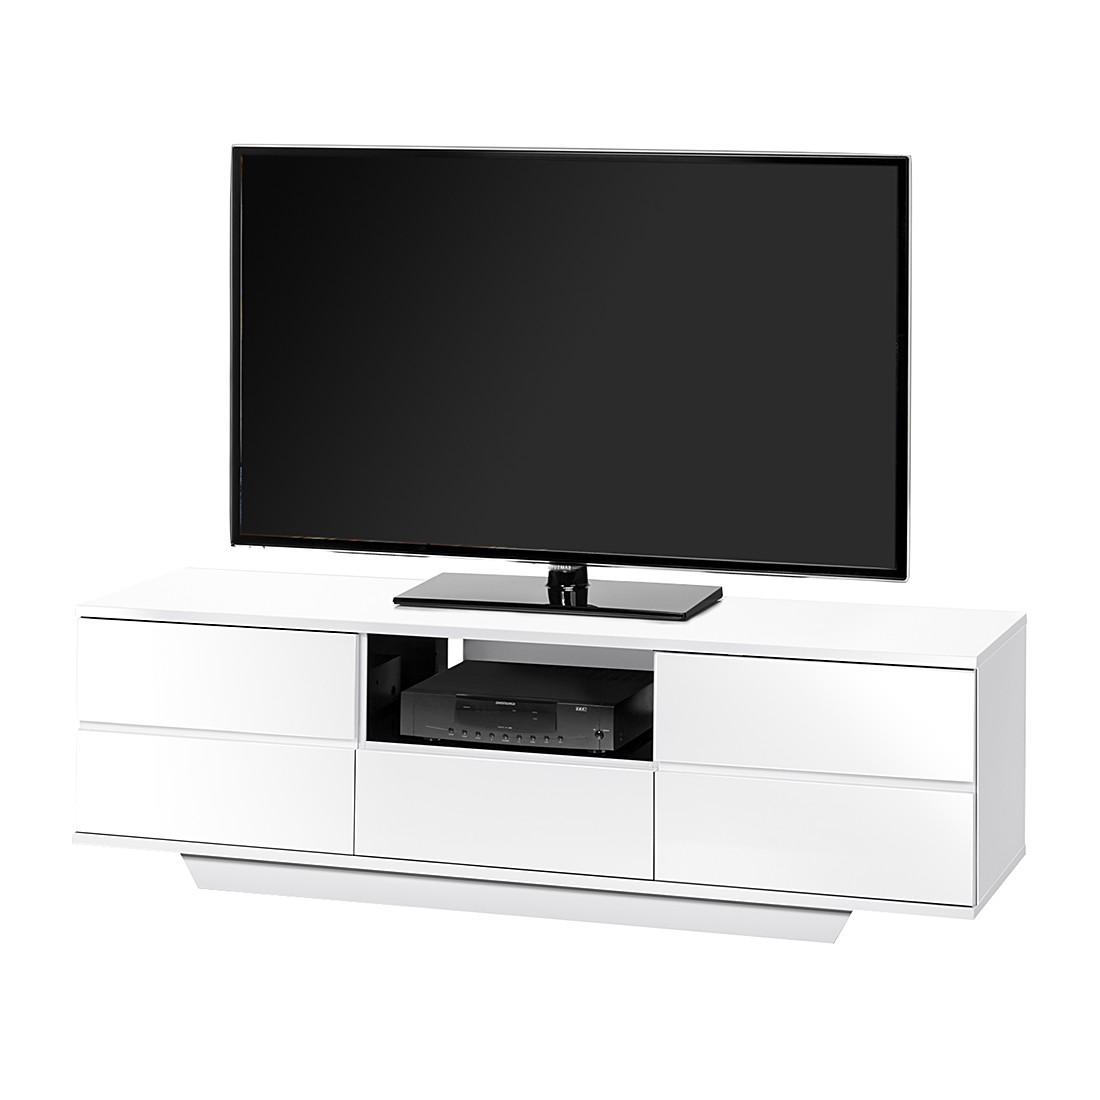 Tv Bank Schwarz | Ikea Lack Tv Fernseher Bank Fernsehtisch Lowboard Hifi